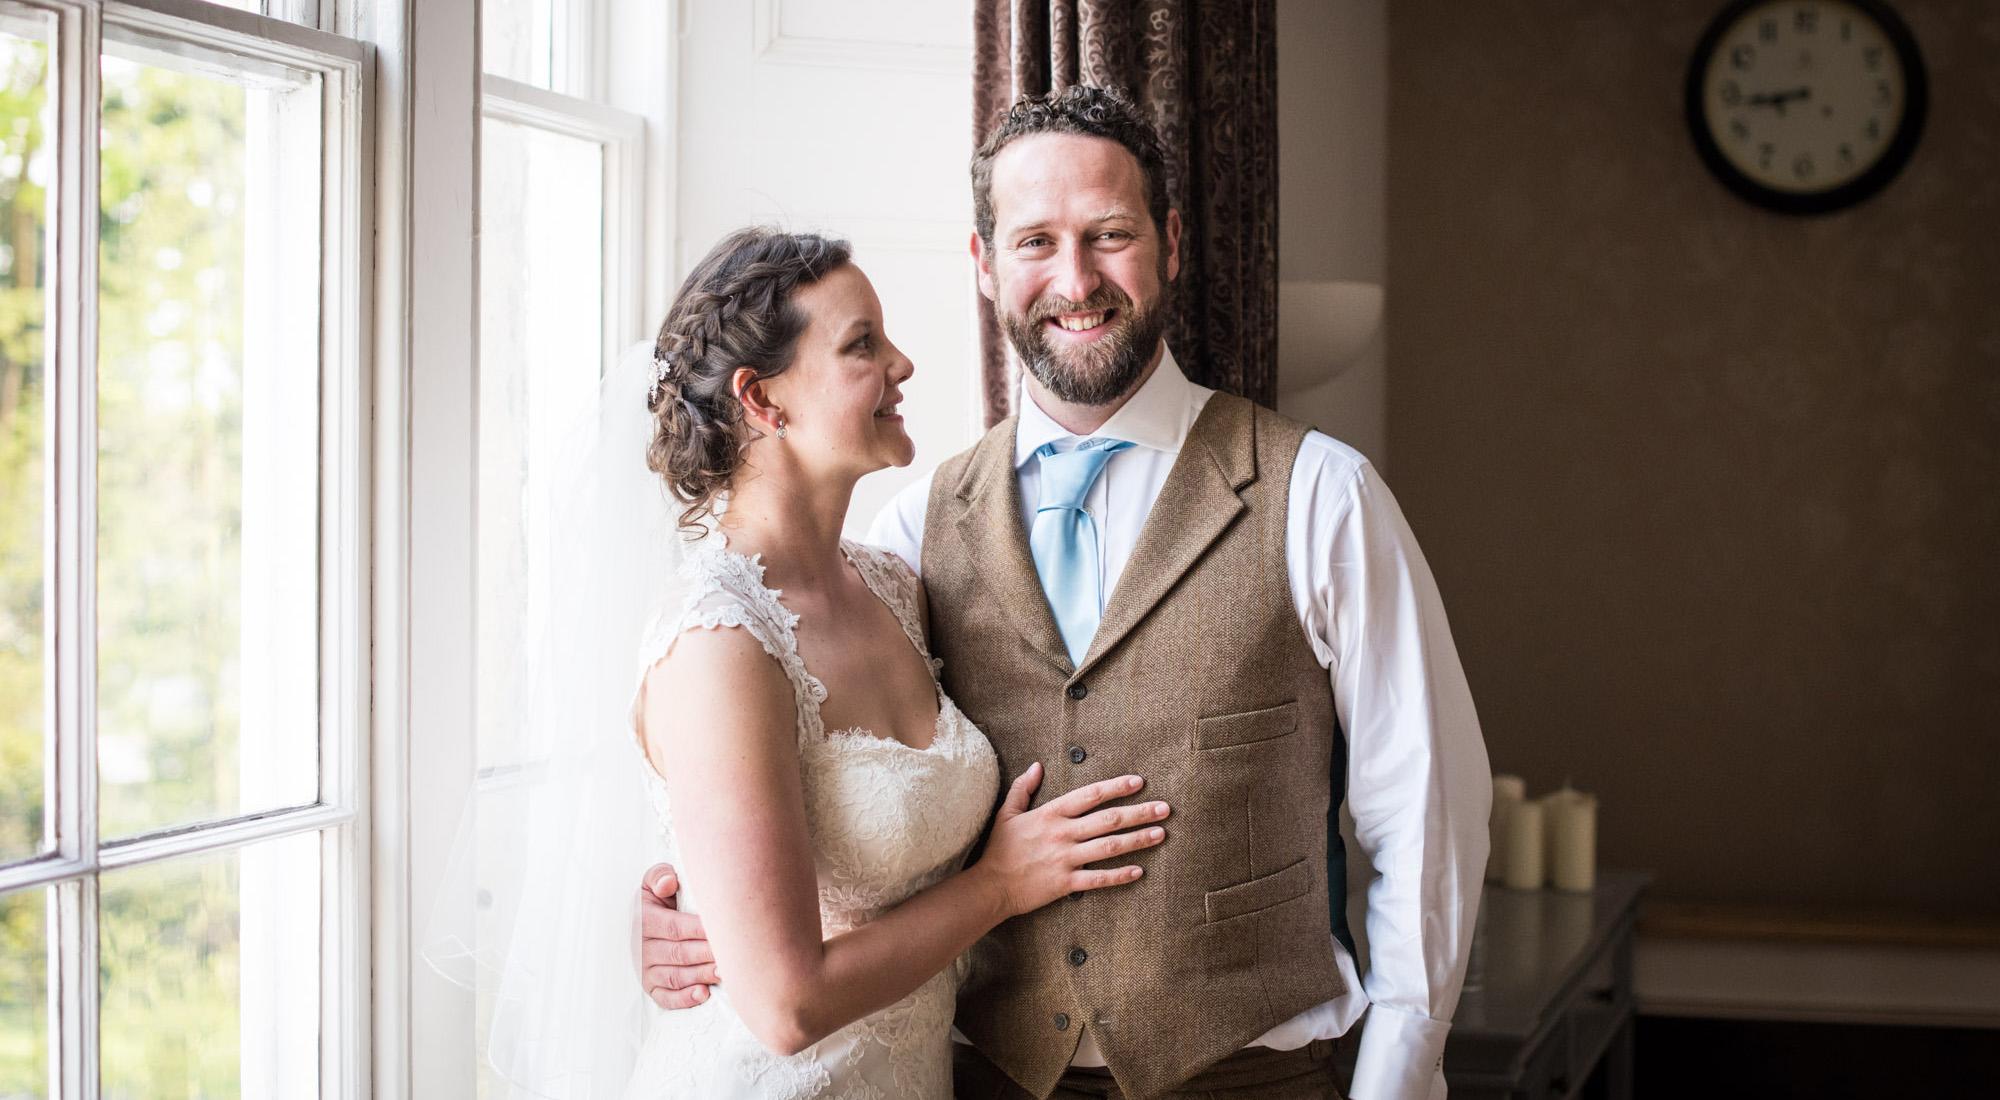 Cirencester wedding photography